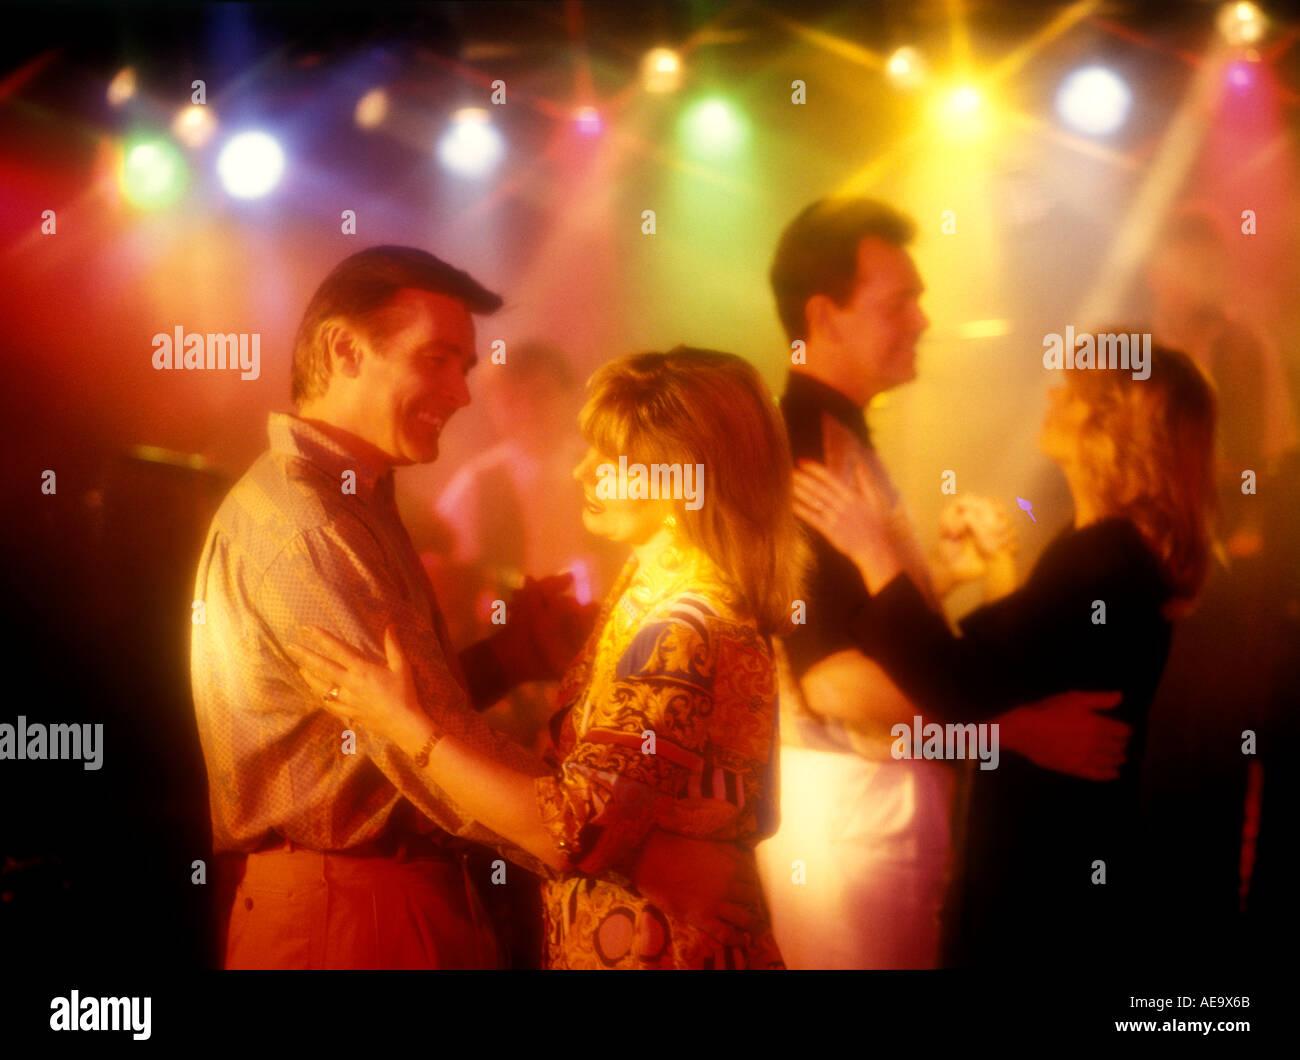 Due coppie Ballare in discoteca night club sorridente holding hands dancing colore luci di gel Immagini Stock